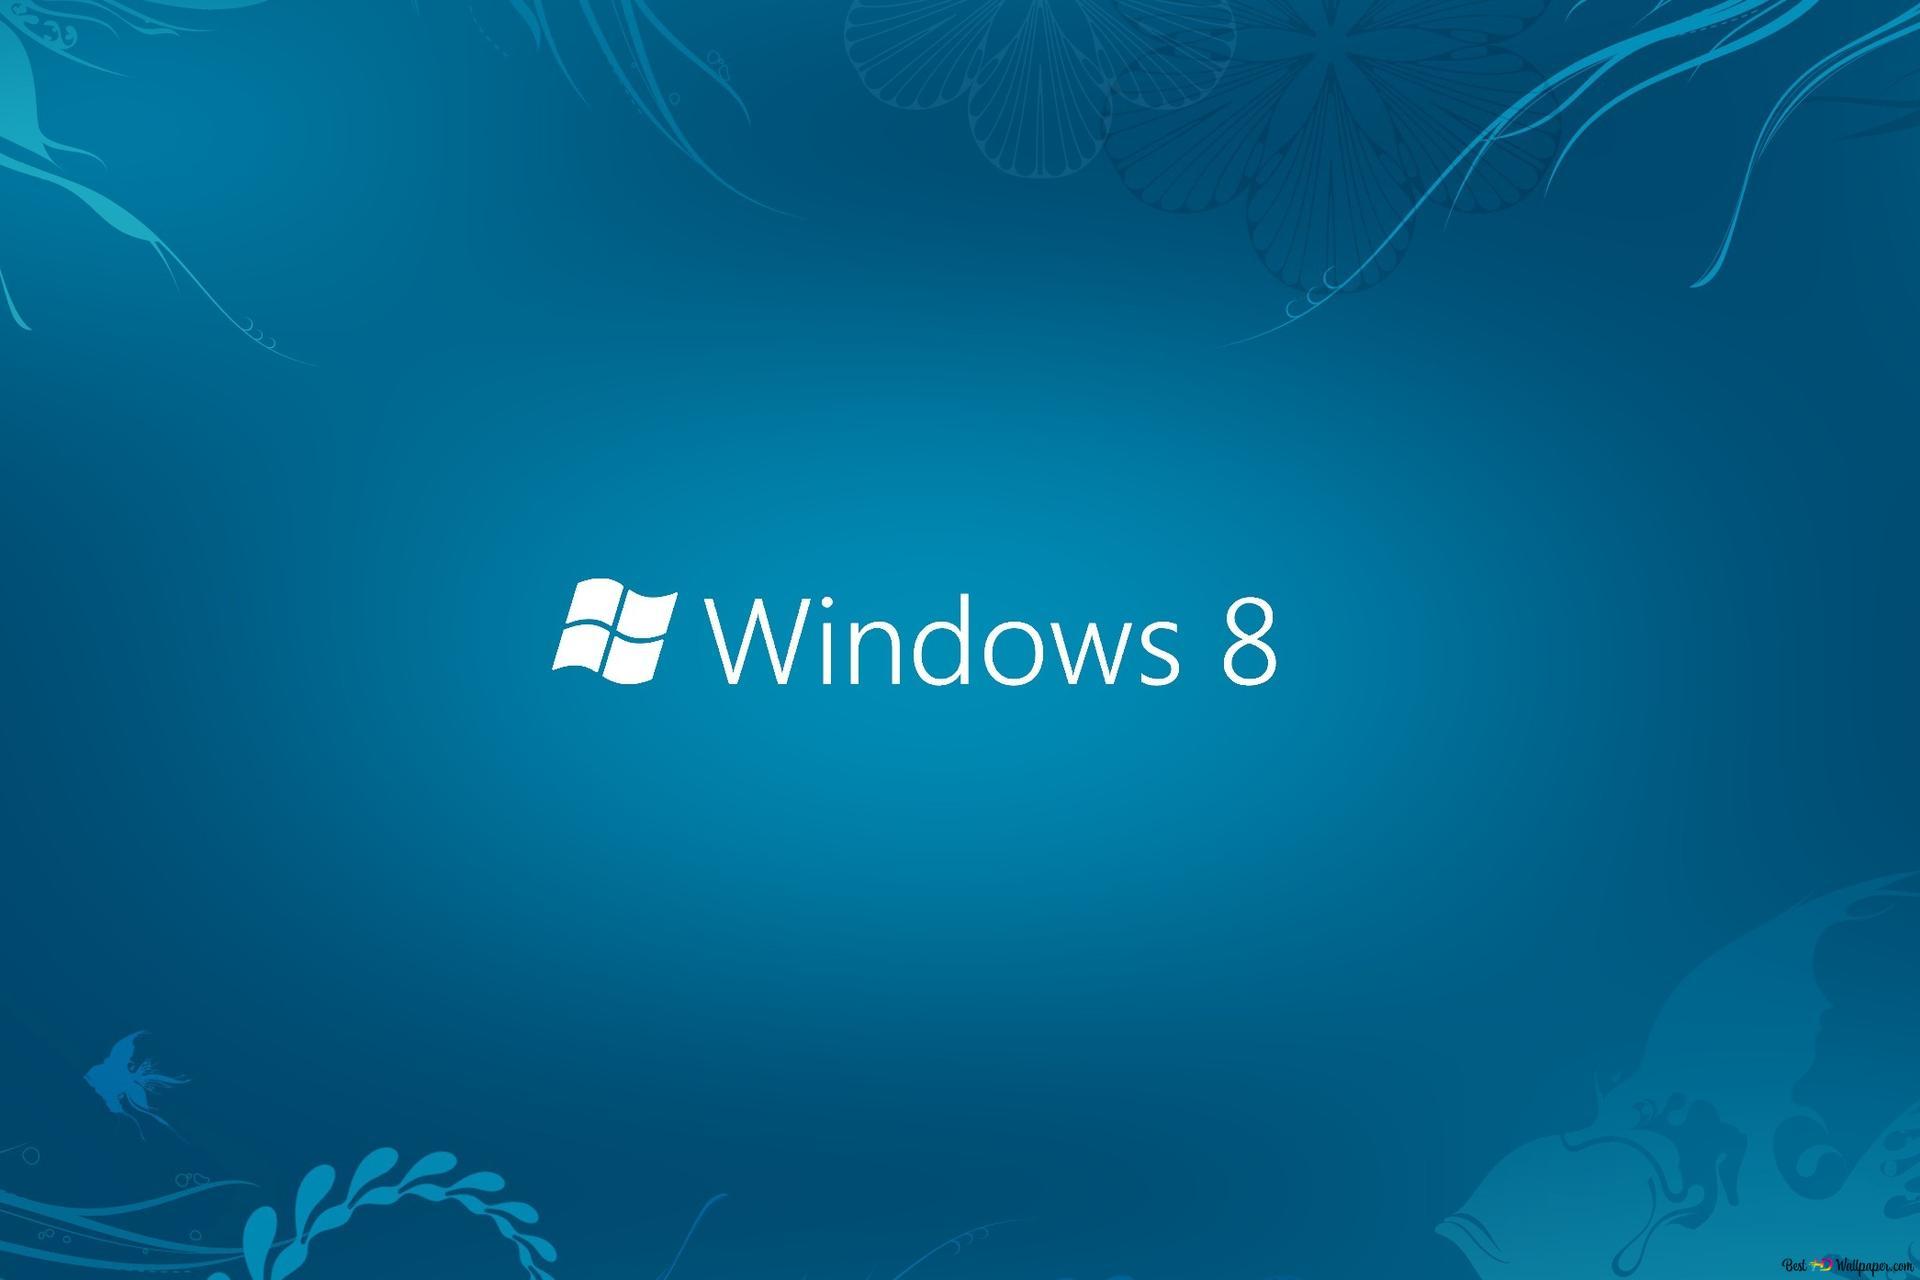 Microsoft Windowsの8 Hd壁紙のダウンロード